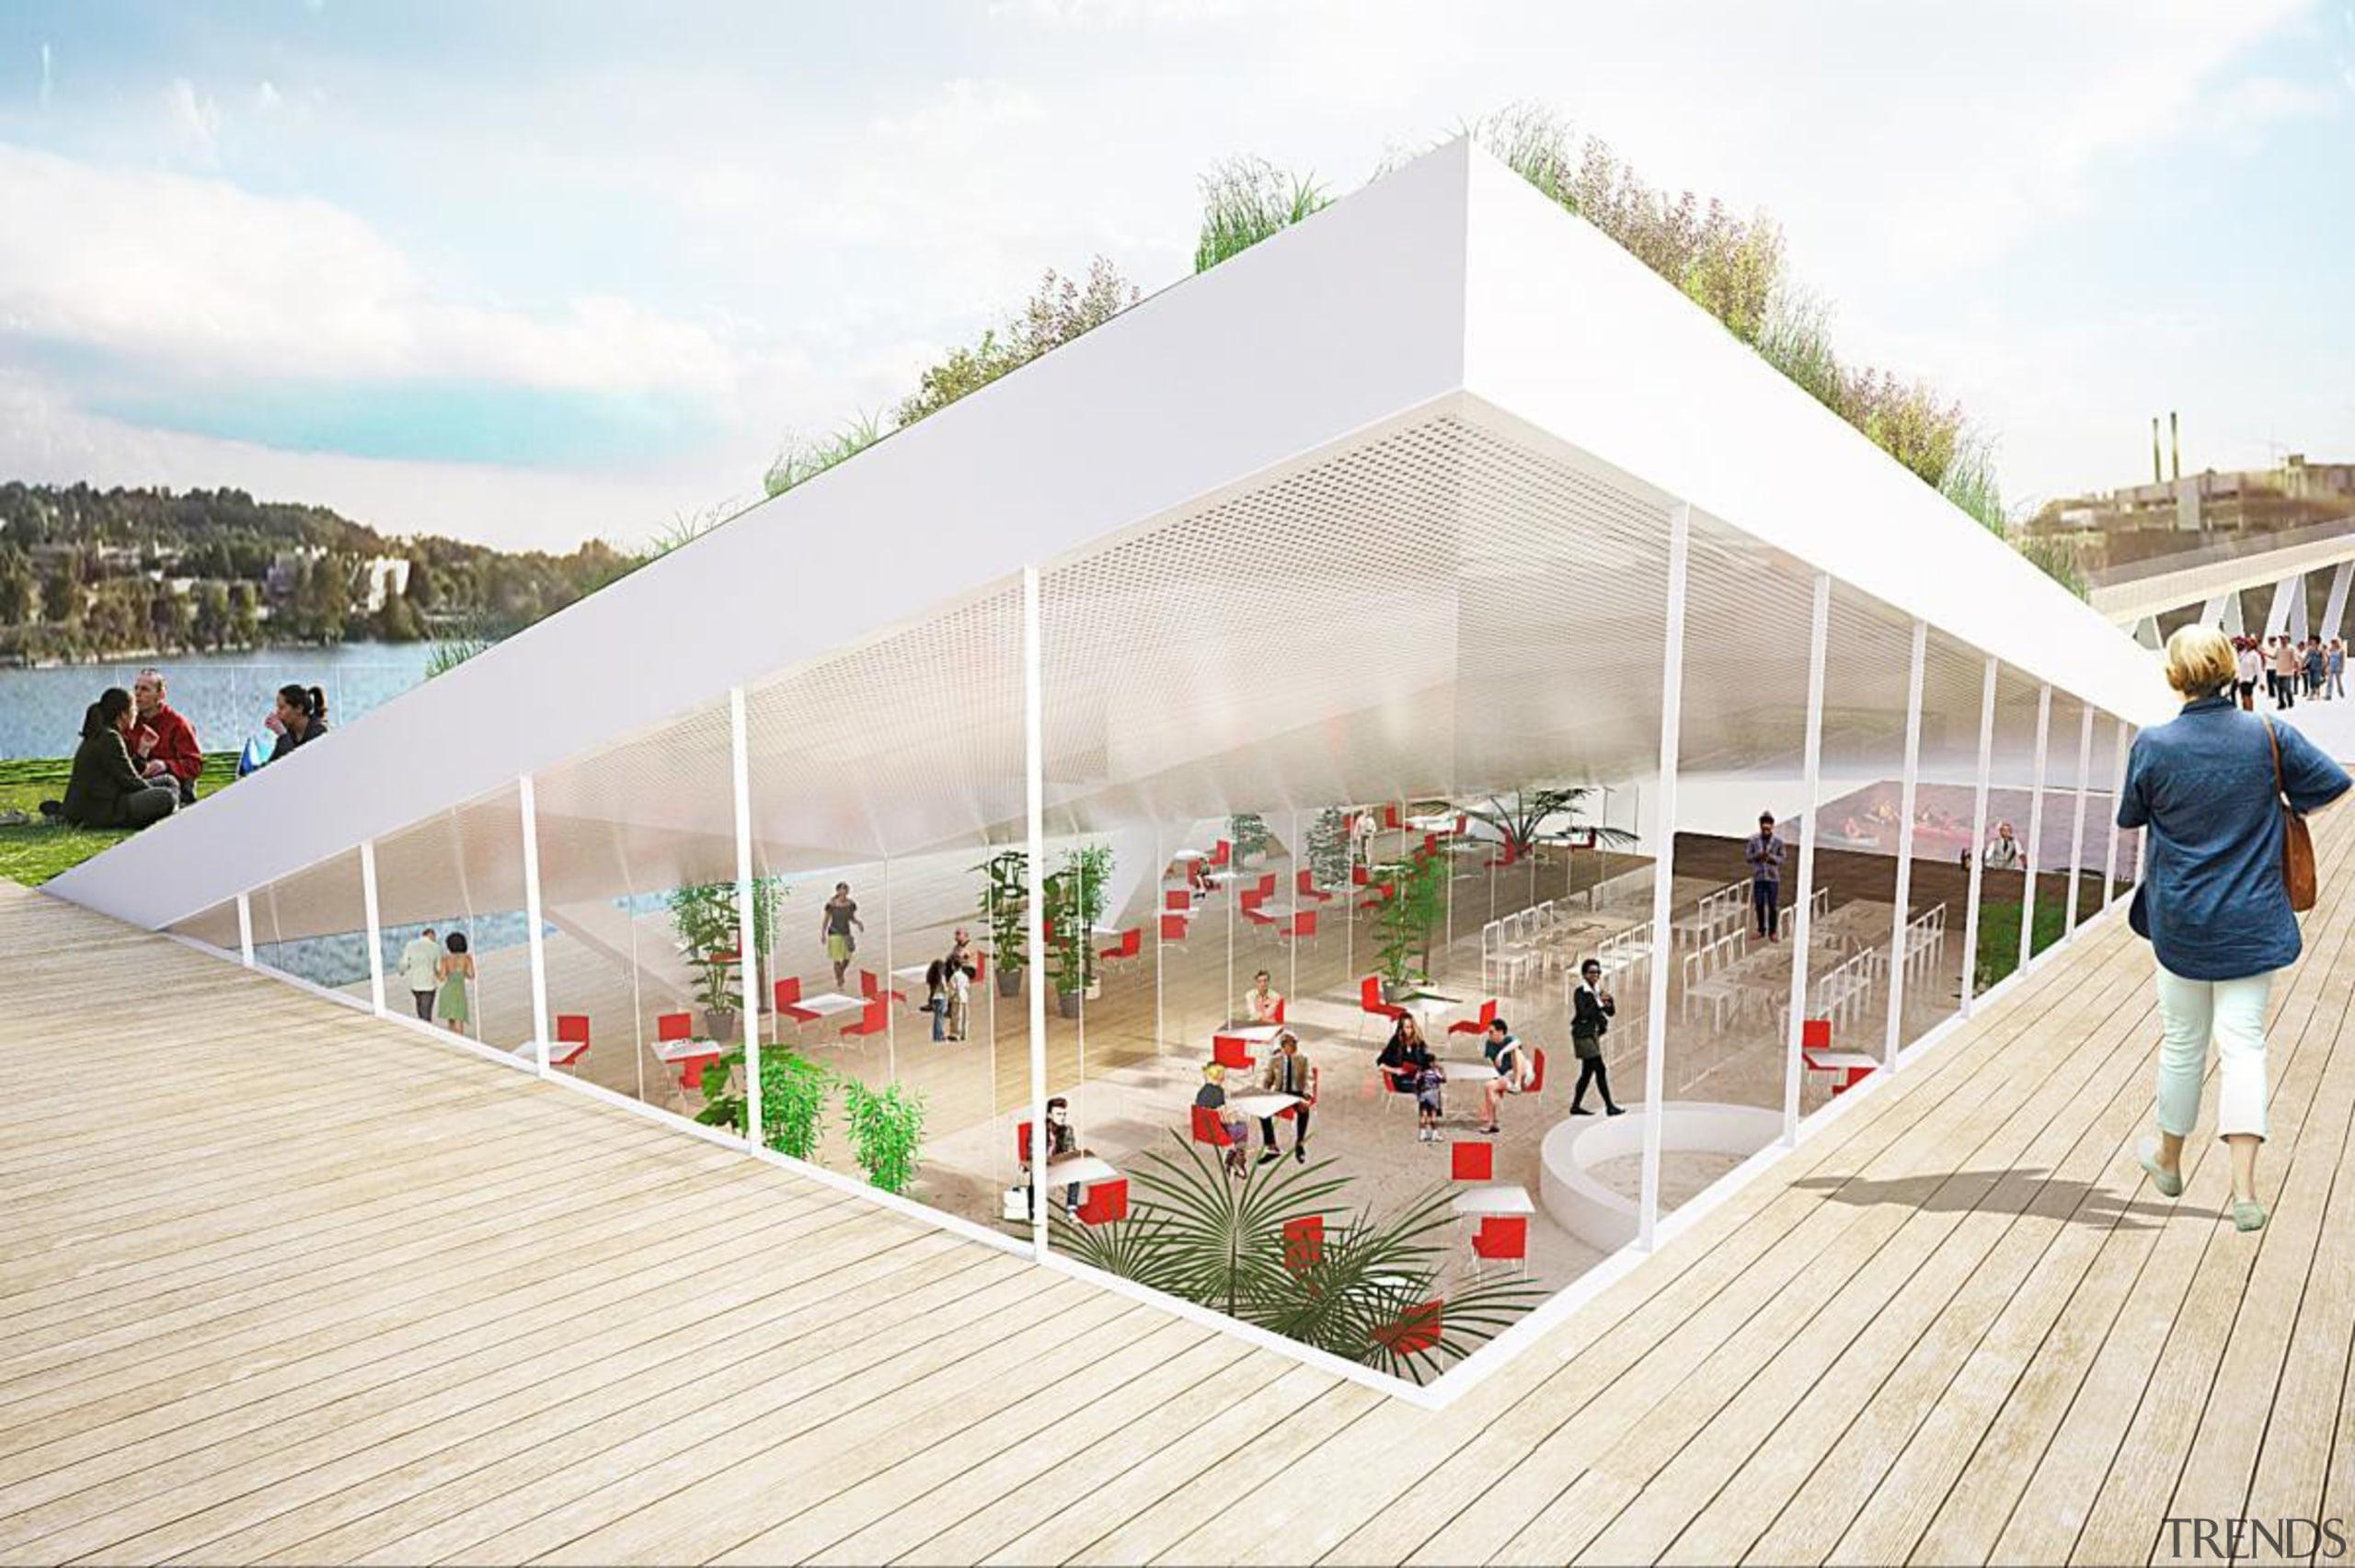 High line park - High line park - architecture, leisure, mixed use, pavilion, structure, urban design, white